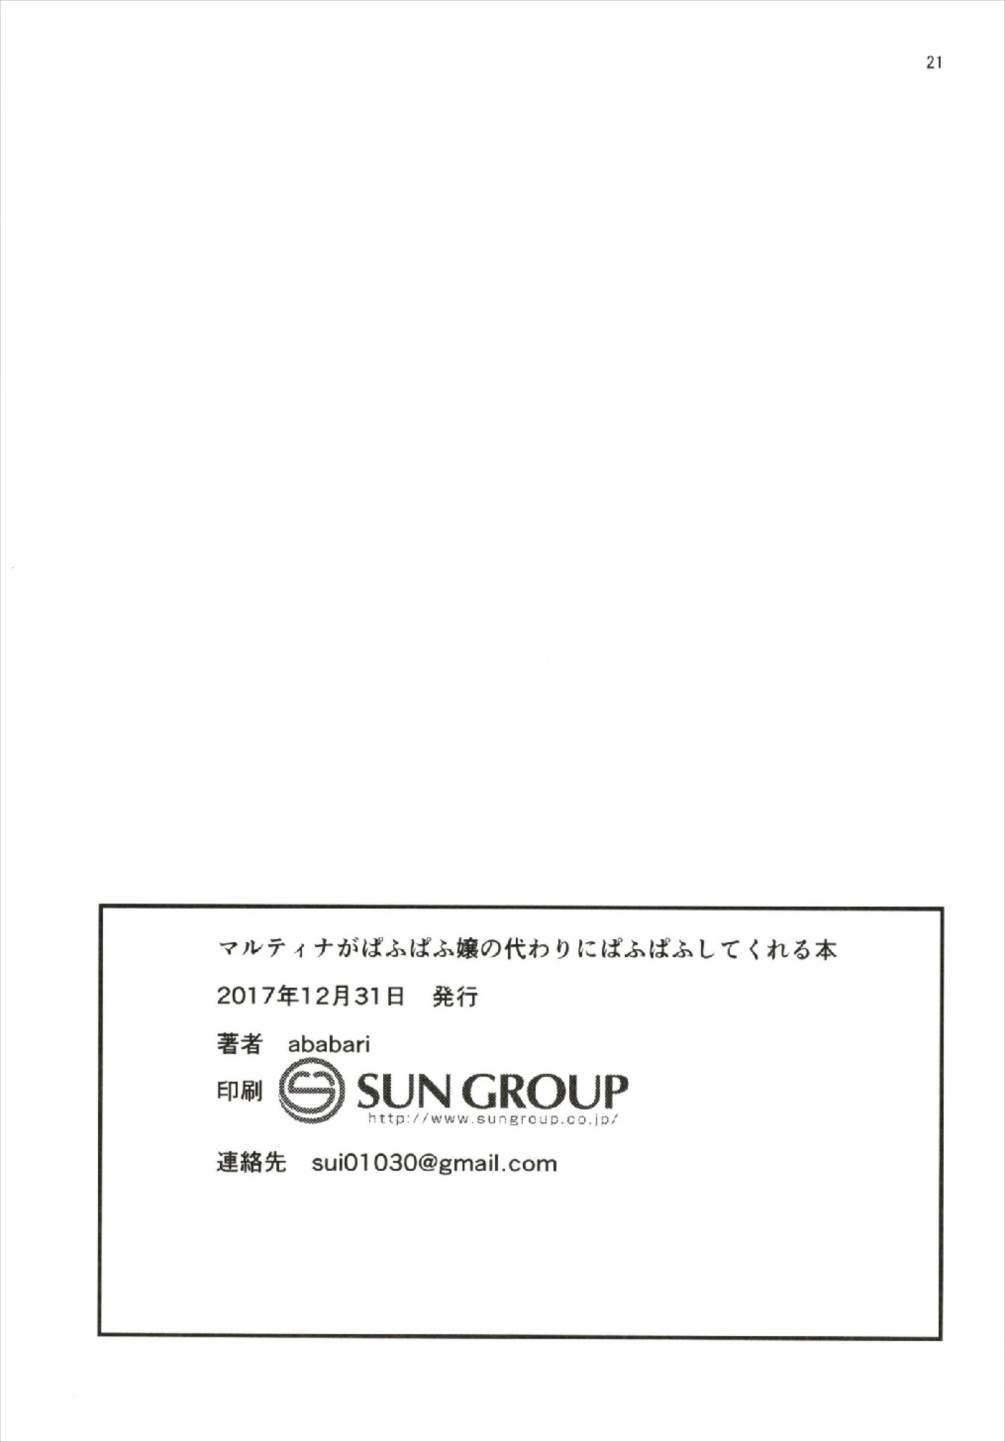 (C93) [Ugokuna pharmacy θ (ababari)] Martina ga Puff-Puff jou no Kawari ni Puff-Puff Shite Kureru Hon (Dragon Quest XI) 20